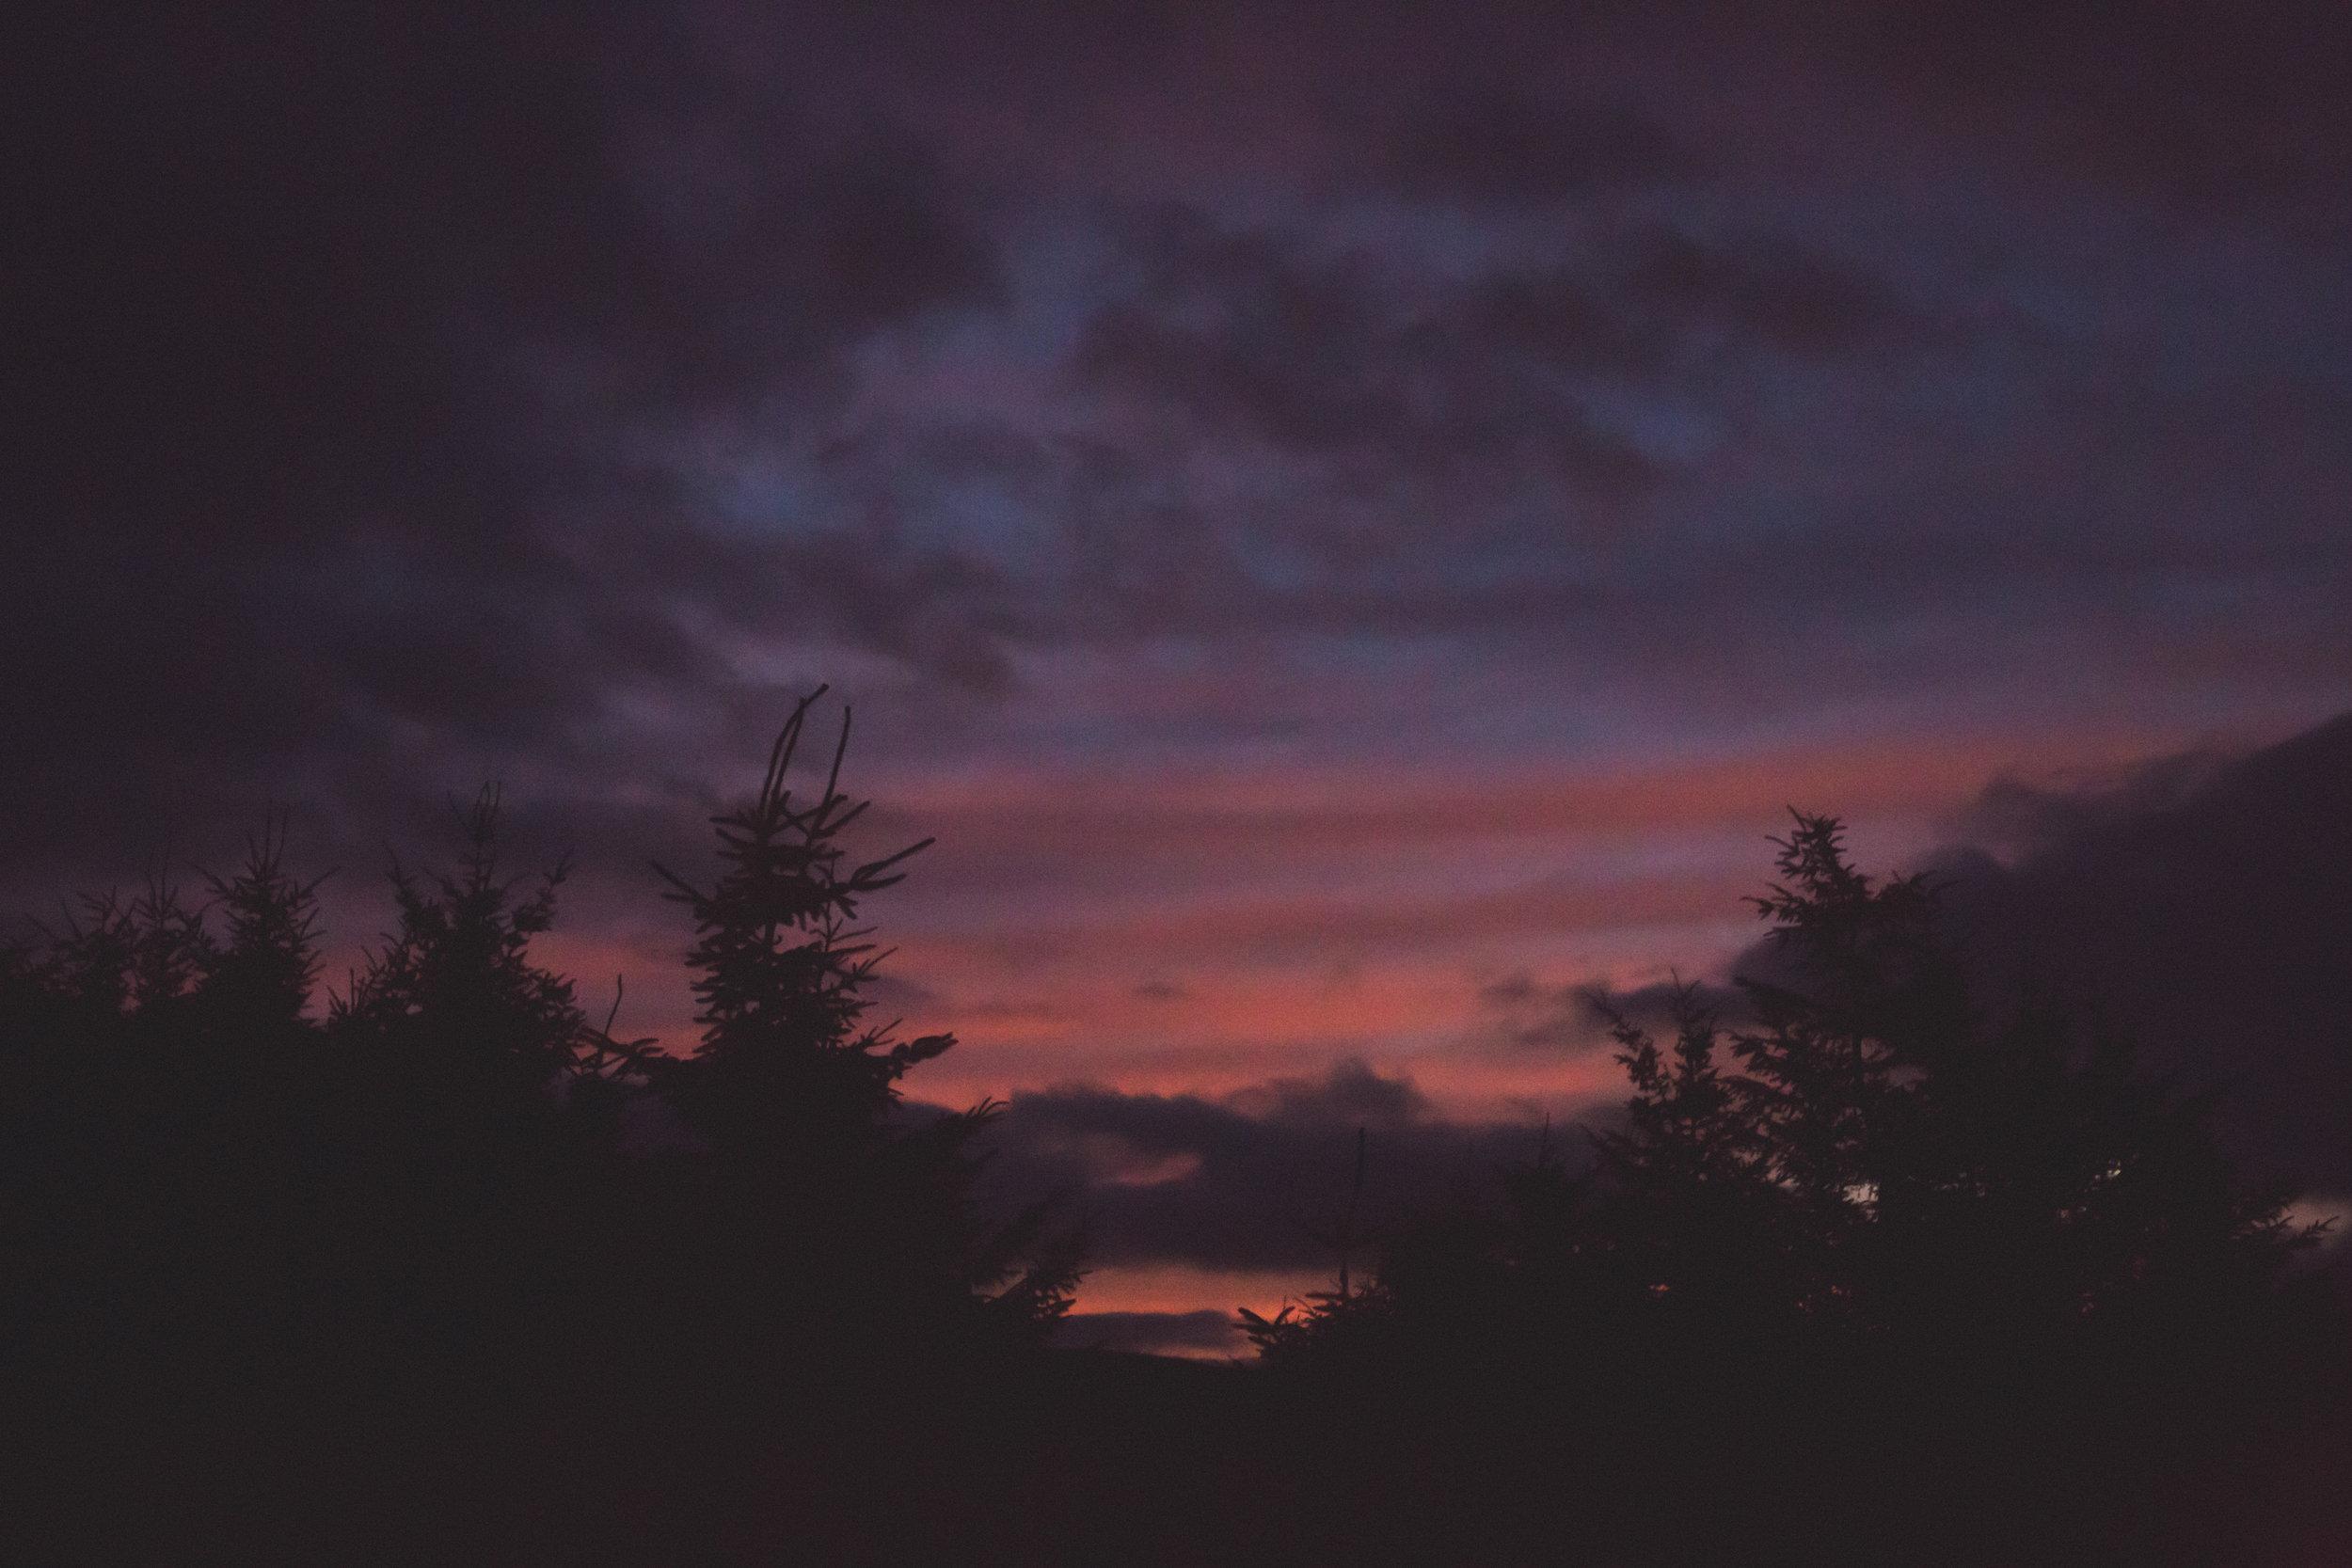 Fraser_Taylor_Scotland-68.jpg